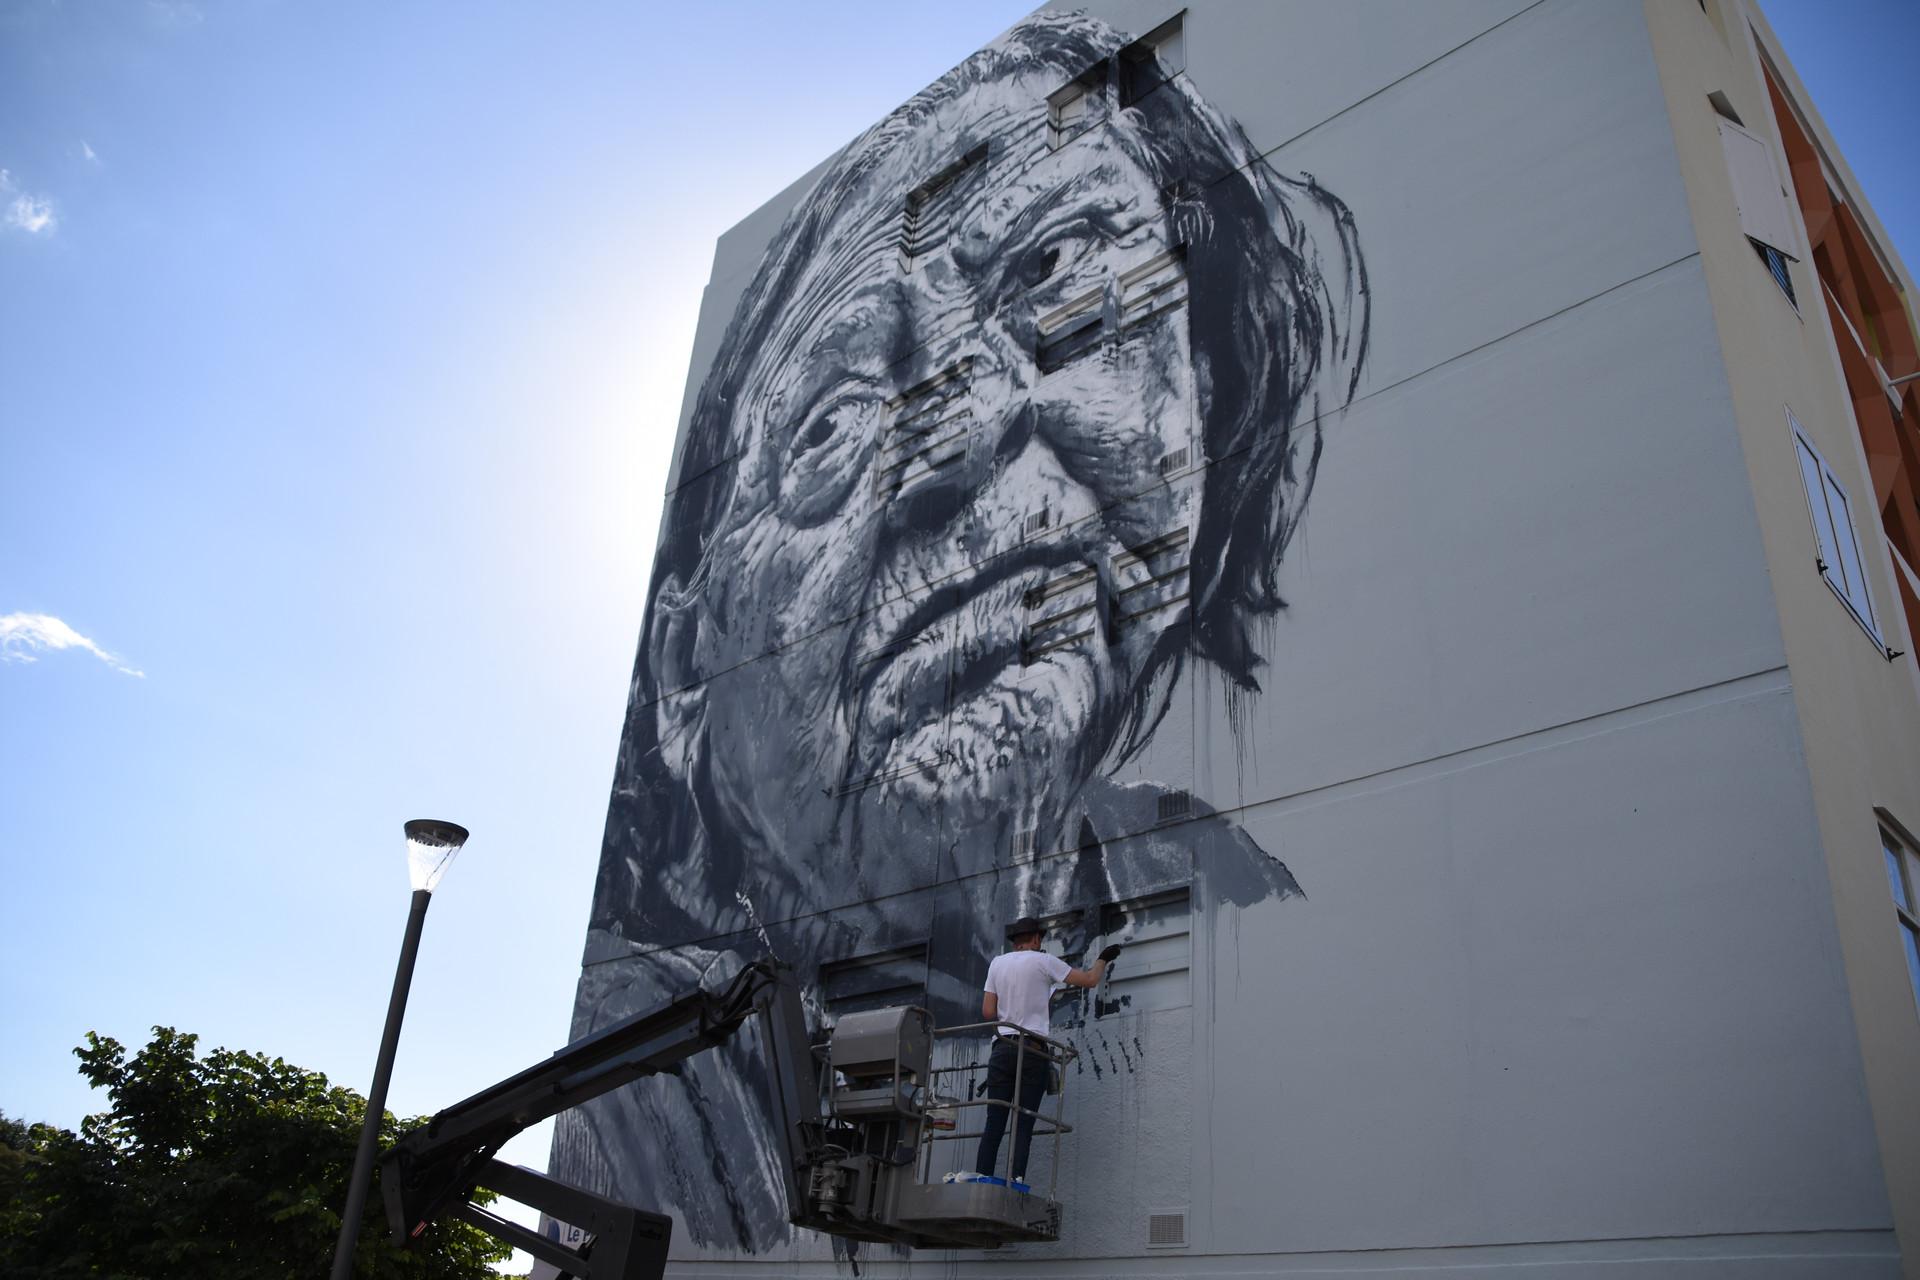 ECB street art